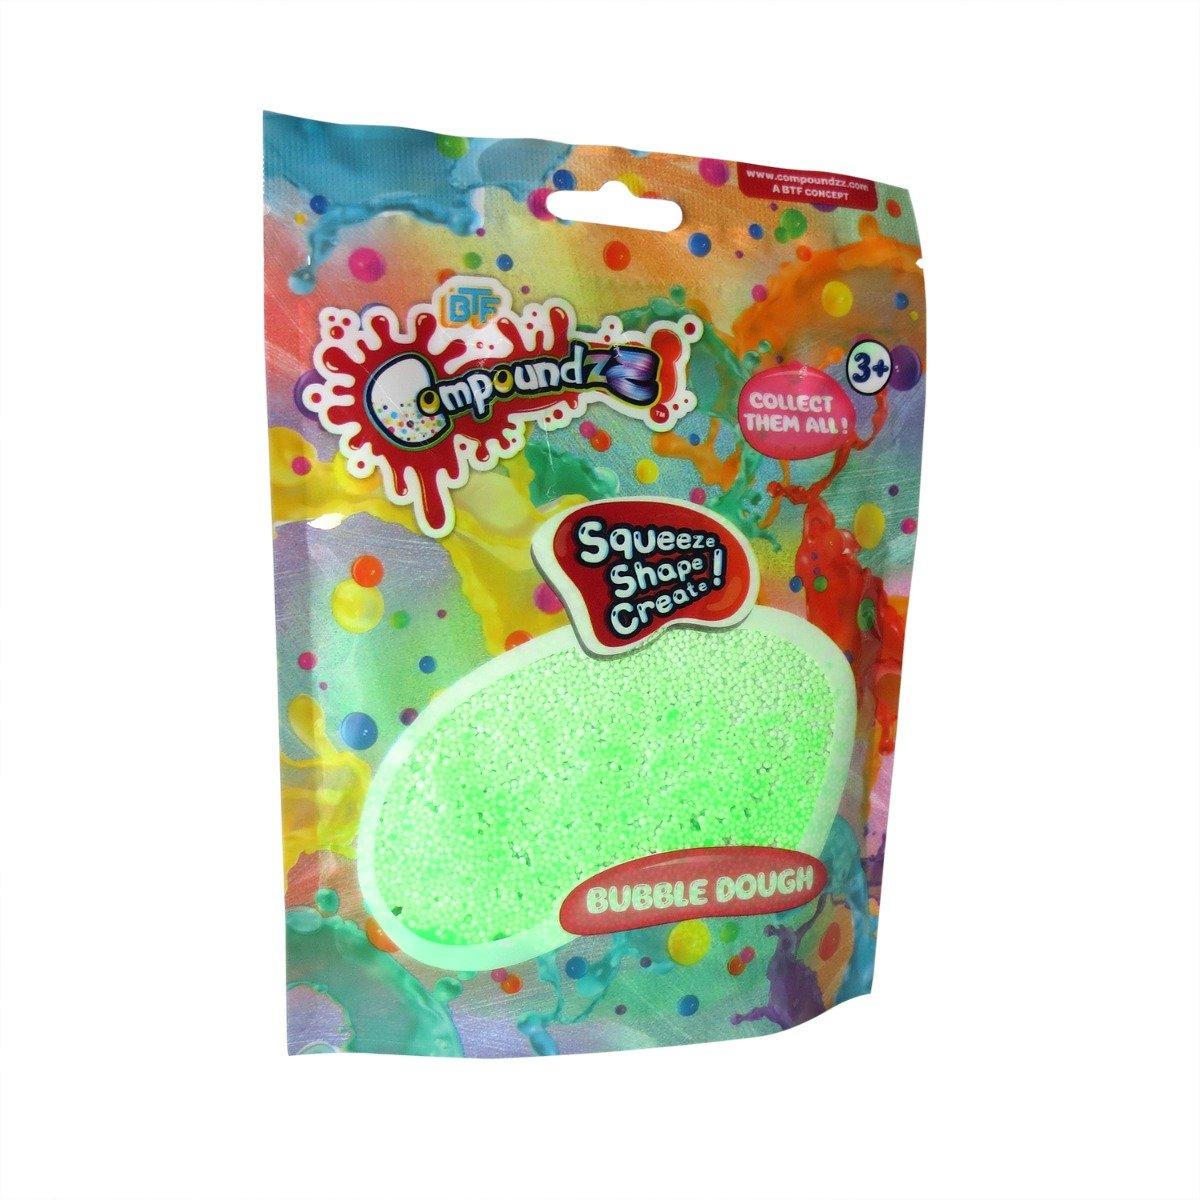 Punguta cu pasta modelatoare Compoundzz, Bubble Dough